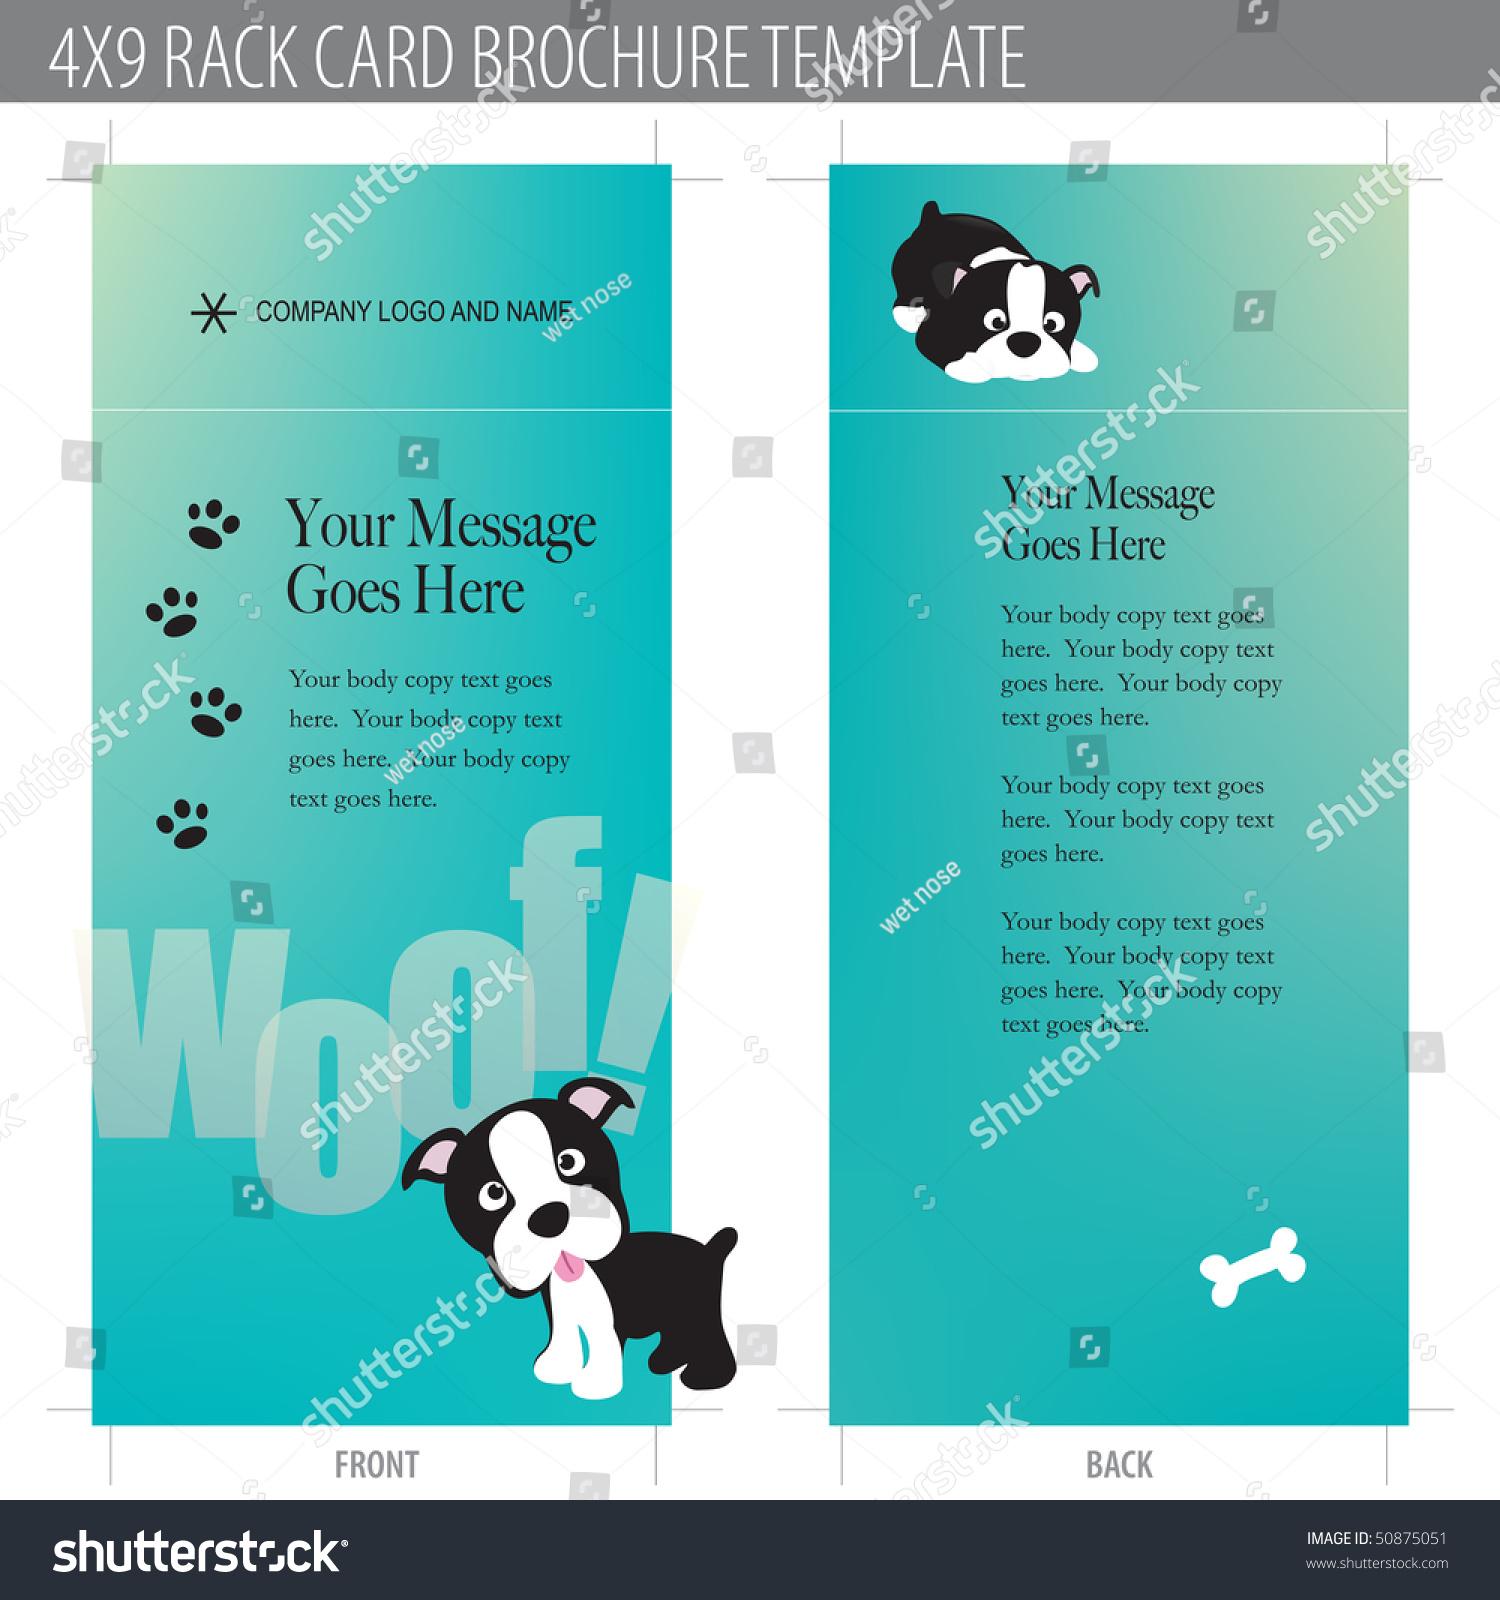 4x9 rack card brochure template stock vector illustration 50875051 shutterstock. Black Bedroom Furniture Sets. Home Design Ideas